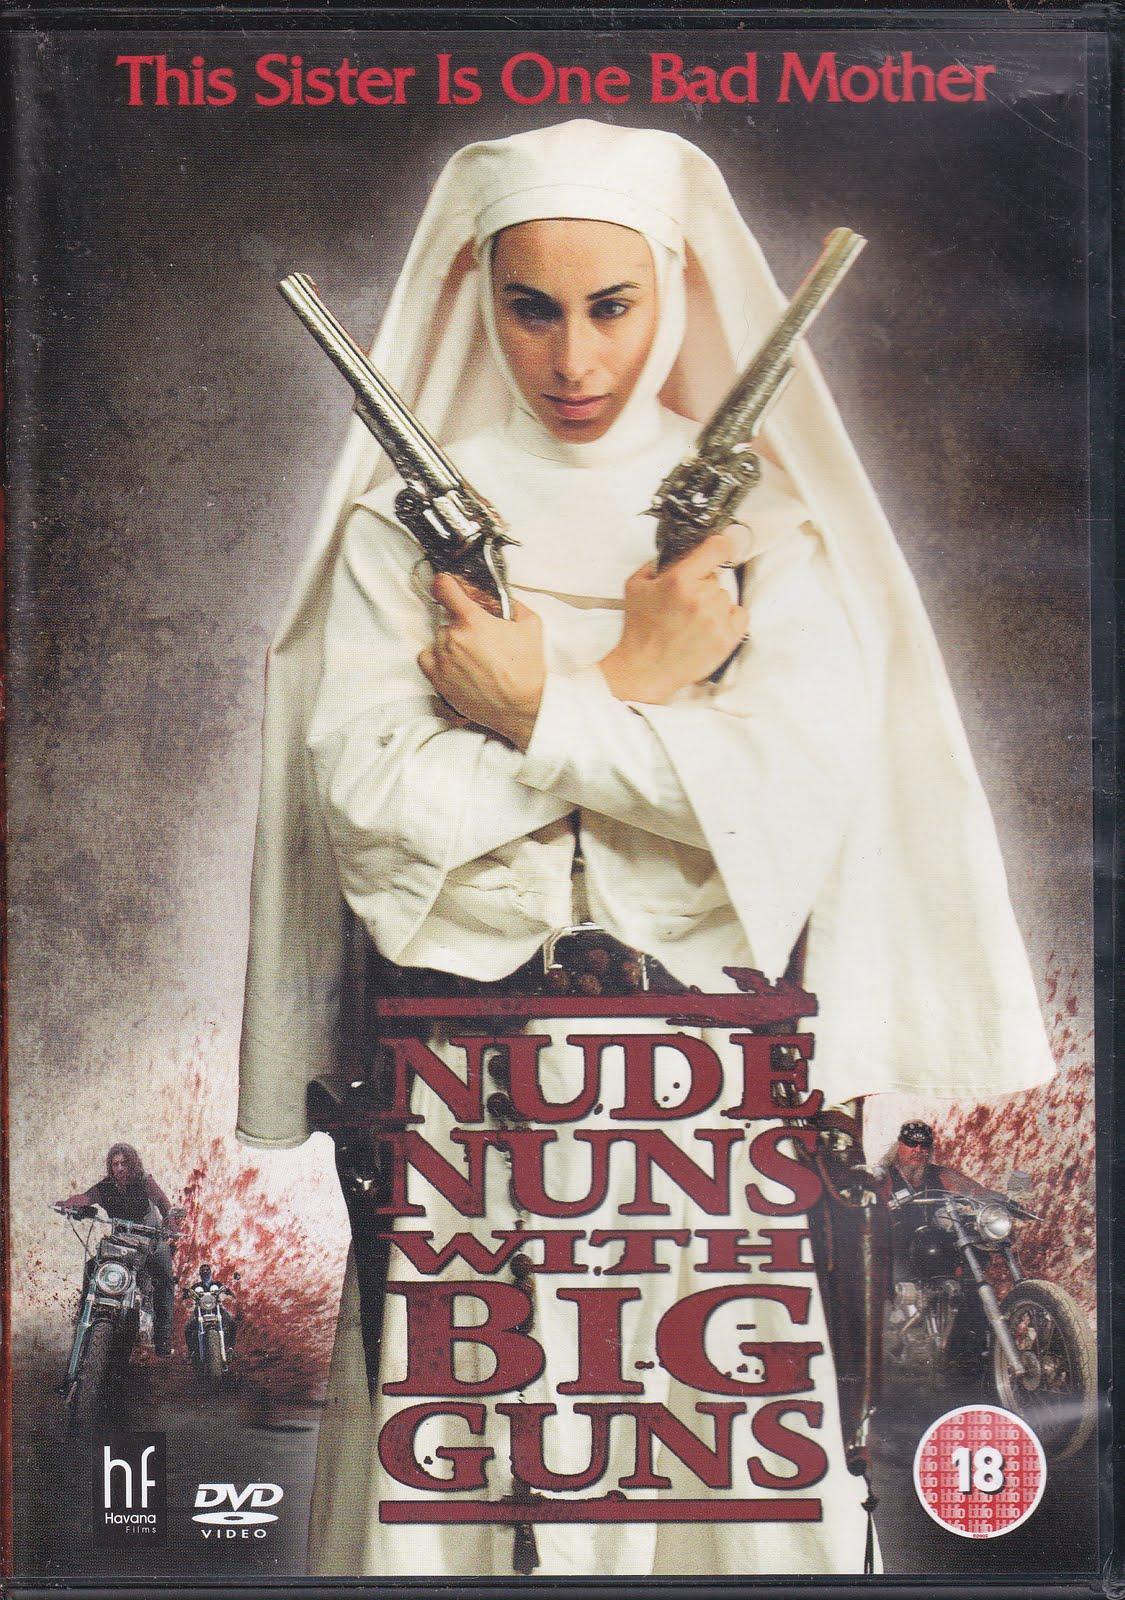 Filmsnude nuns with big guns pornos vids